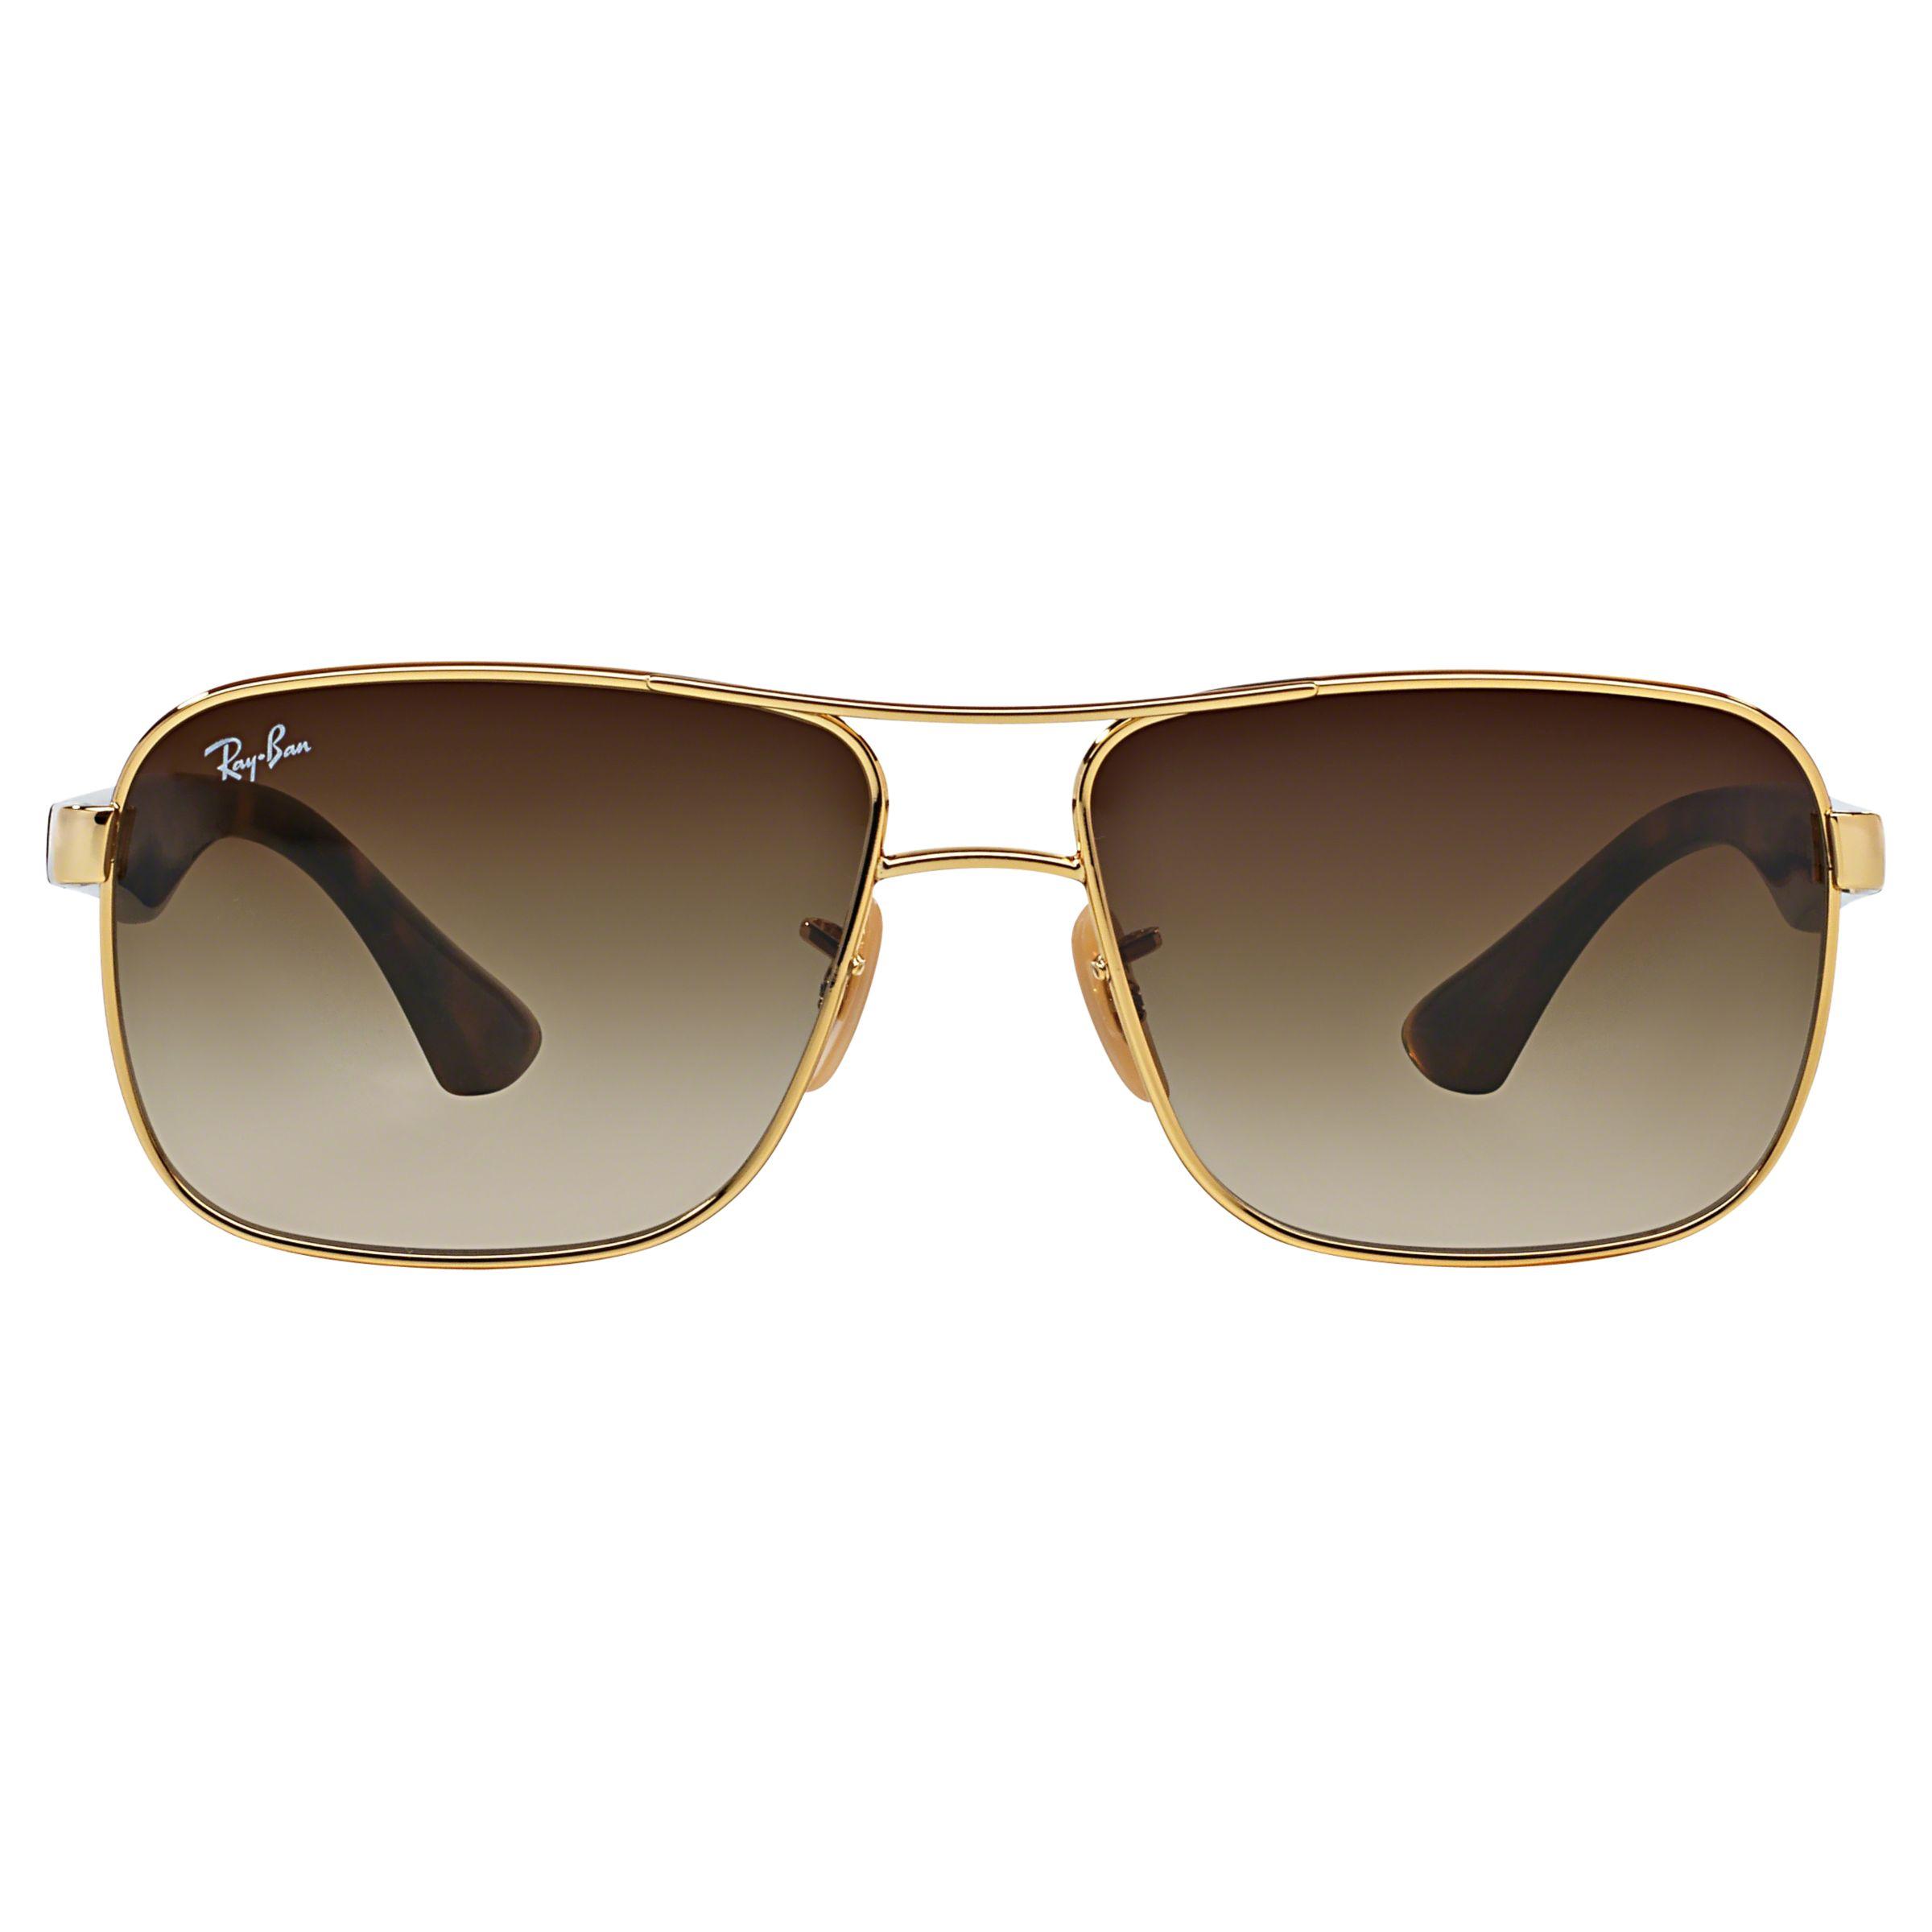 Ray Ban Square Frame Glasses : Buy Ray-Ban RB3516 Square Frame Sunglasses John Lewis